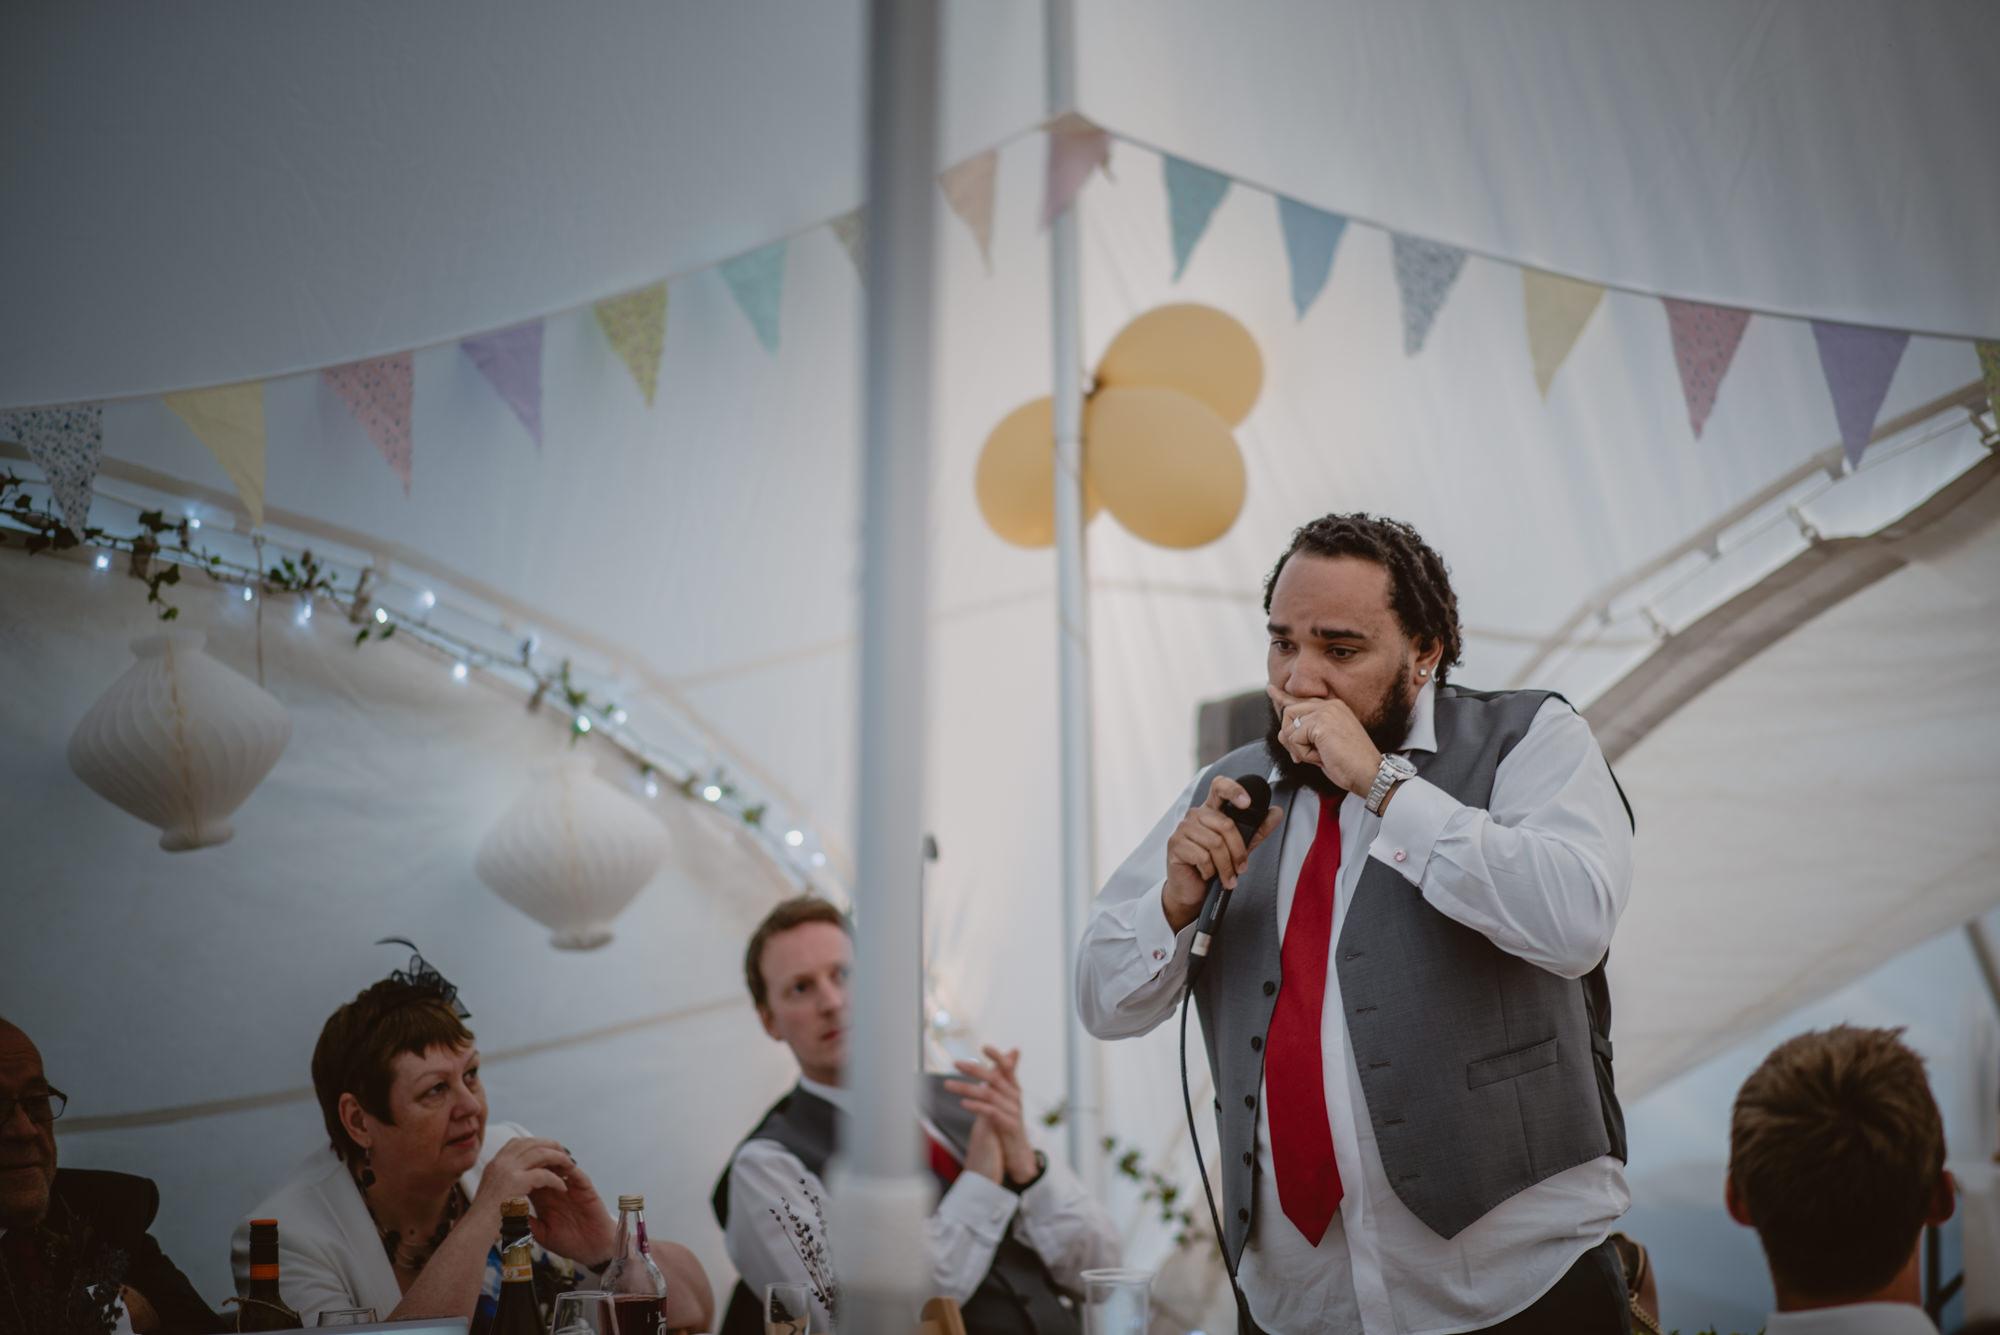 Jacqueline-Gareth-Wedding-Westmead-Events-Surrey-Manu-Mendoza-Wedding-Photography-453.jpg